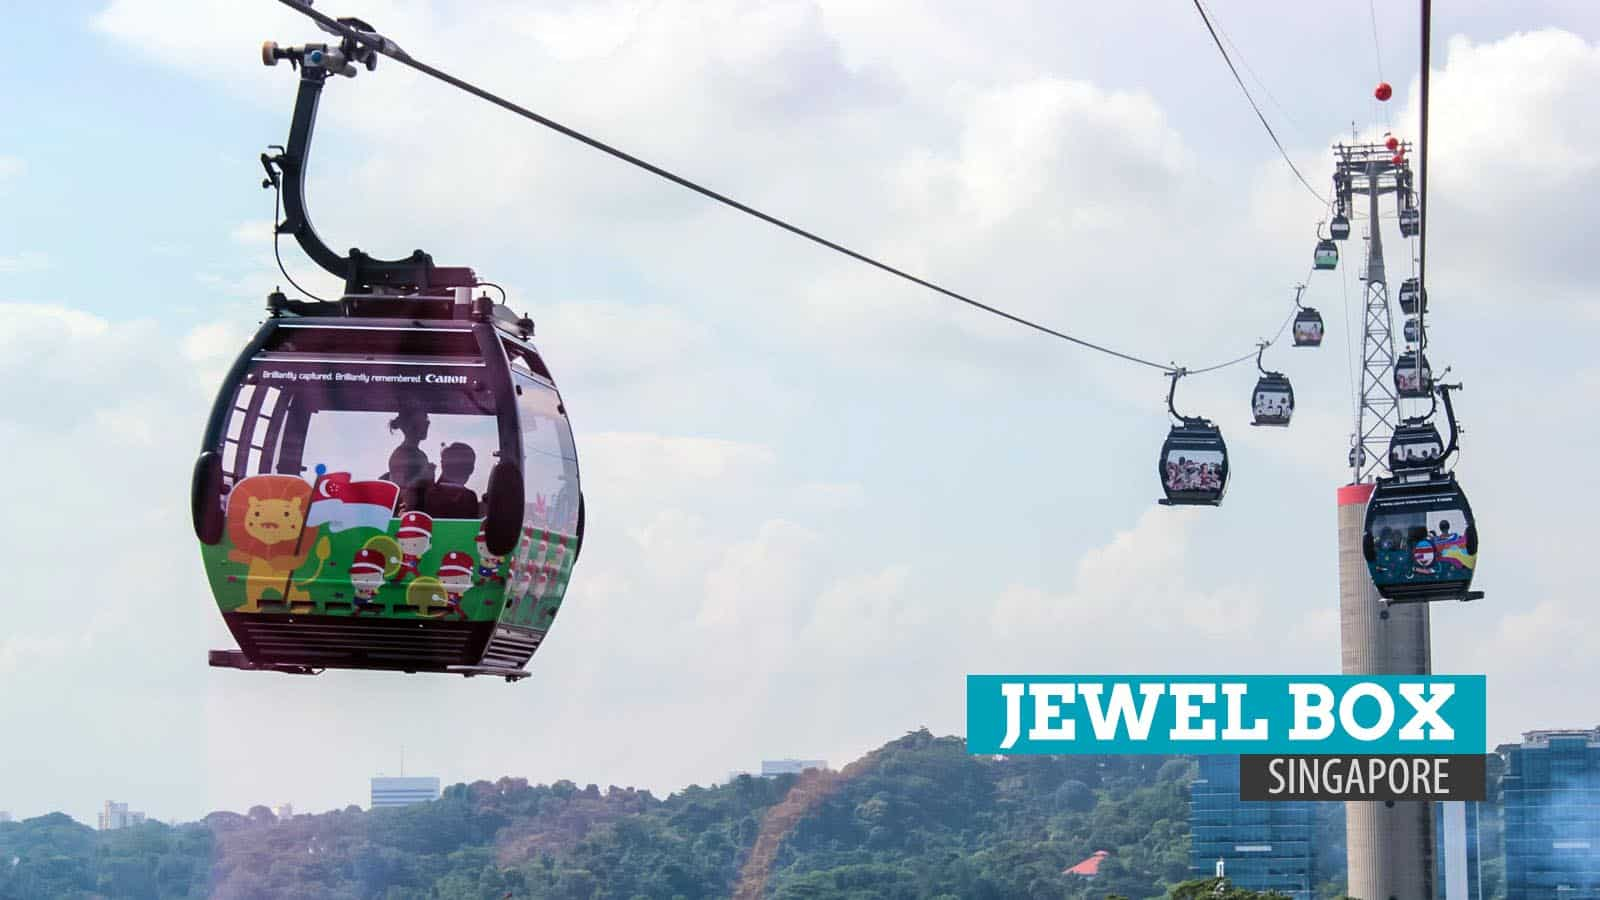 Jewel Box Singapore: Where Everything's a Gem